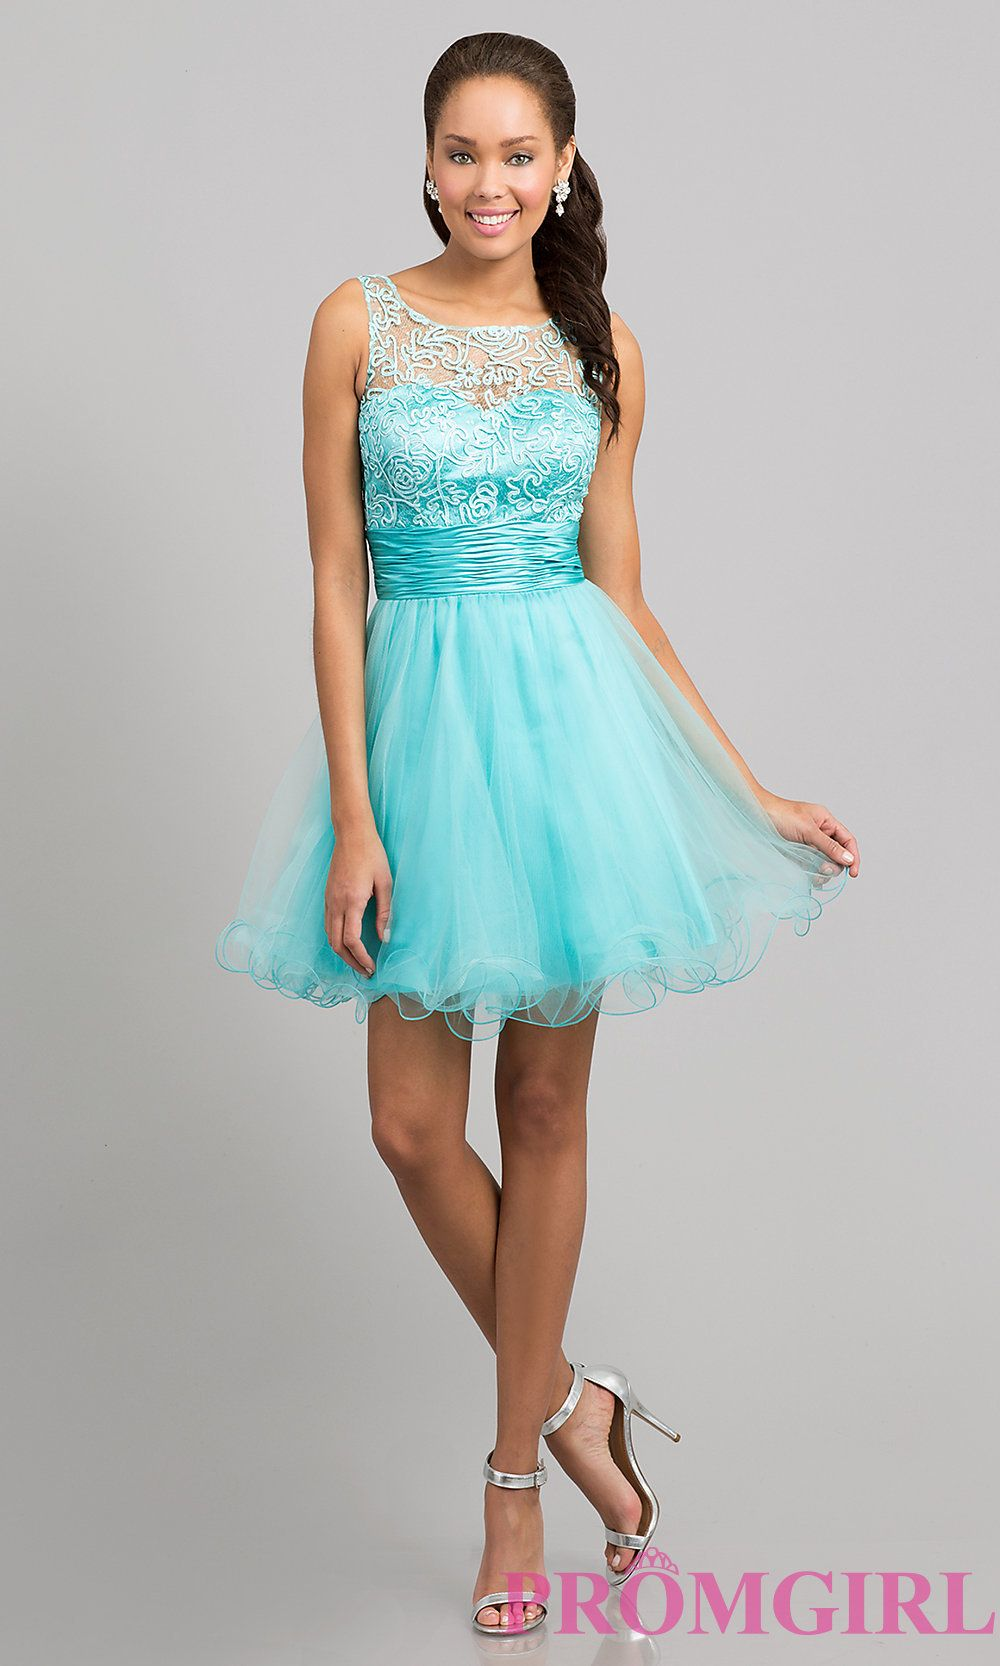 Short Prom Dress Style Dq 8704 Detail Image 1 Damas Dresses Prom Dresses Short Prom Dresses For Teens [ 1666 x 1000 Pixel ]